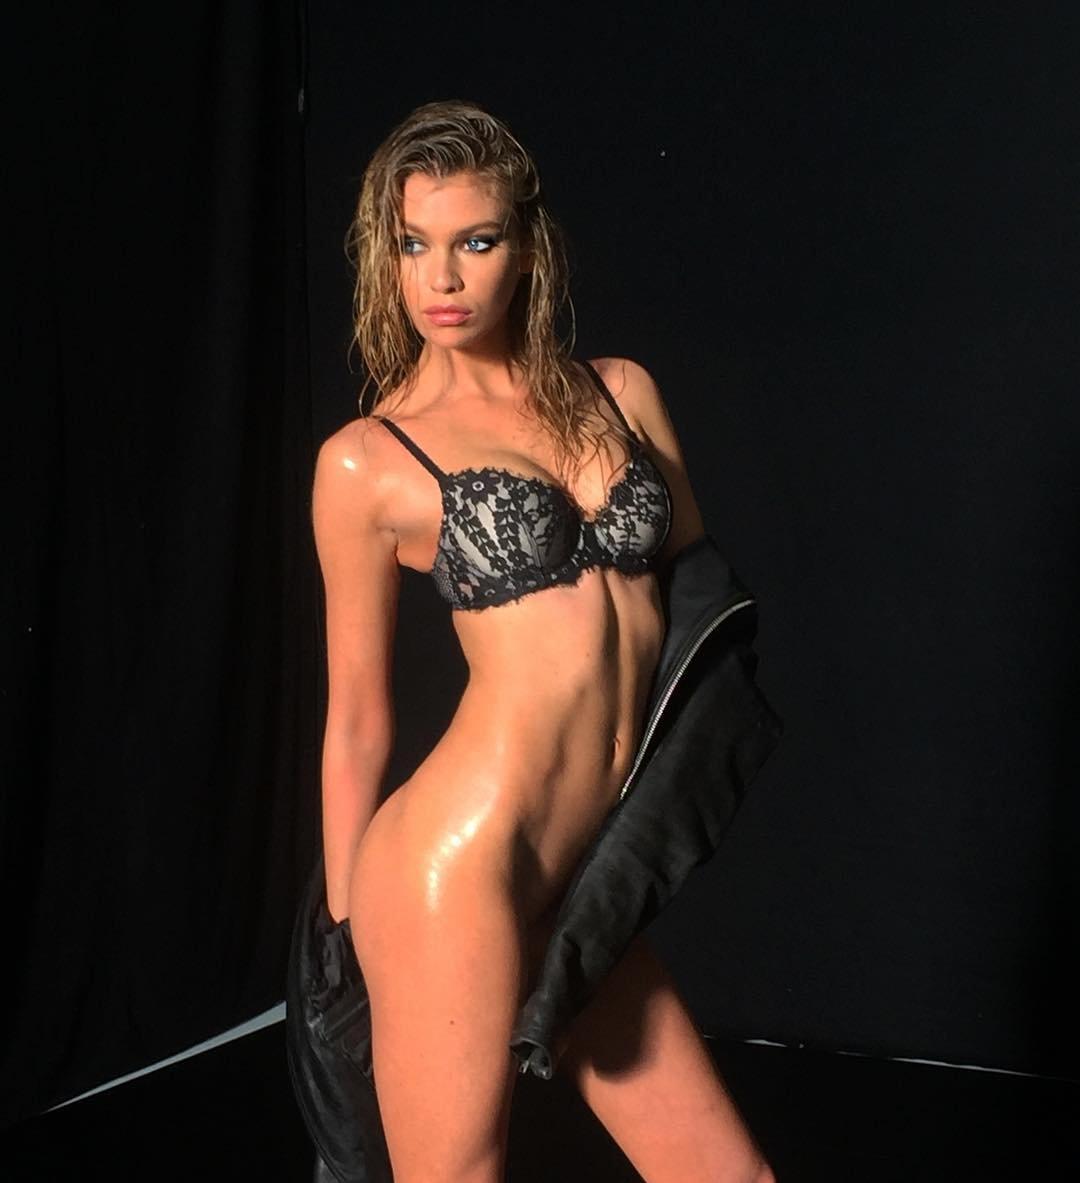 Sehr gerne model porno